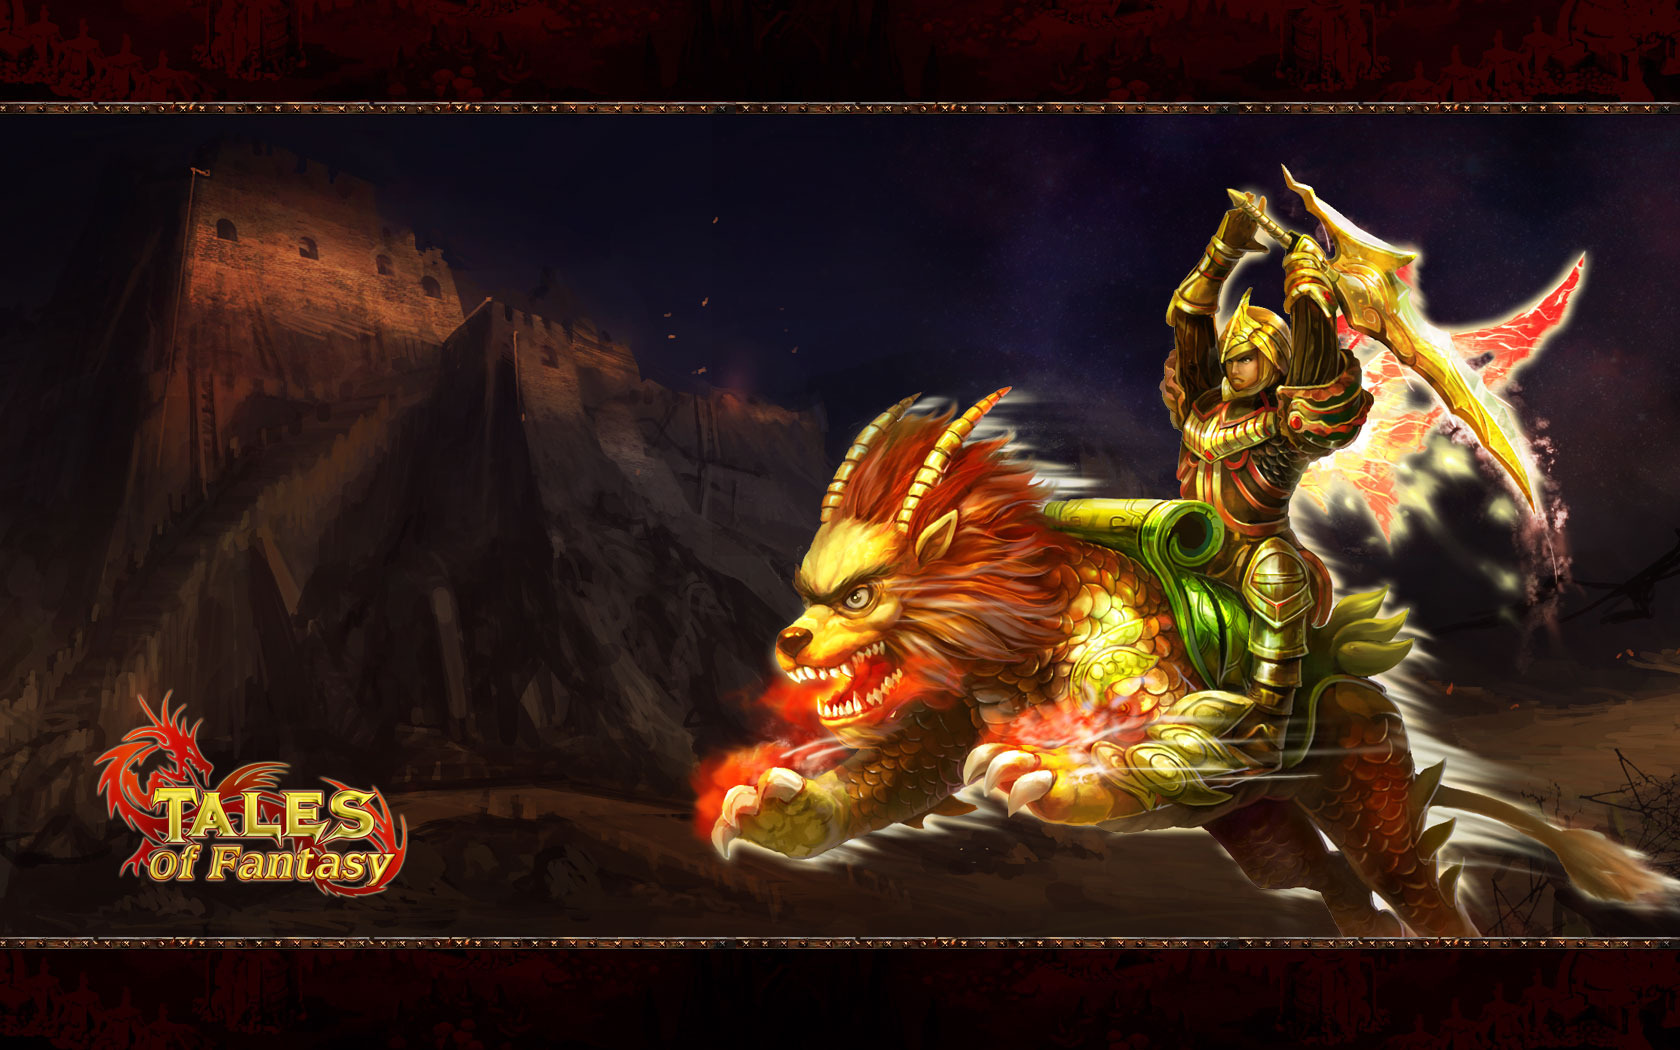 Tales of Fantasy (6)